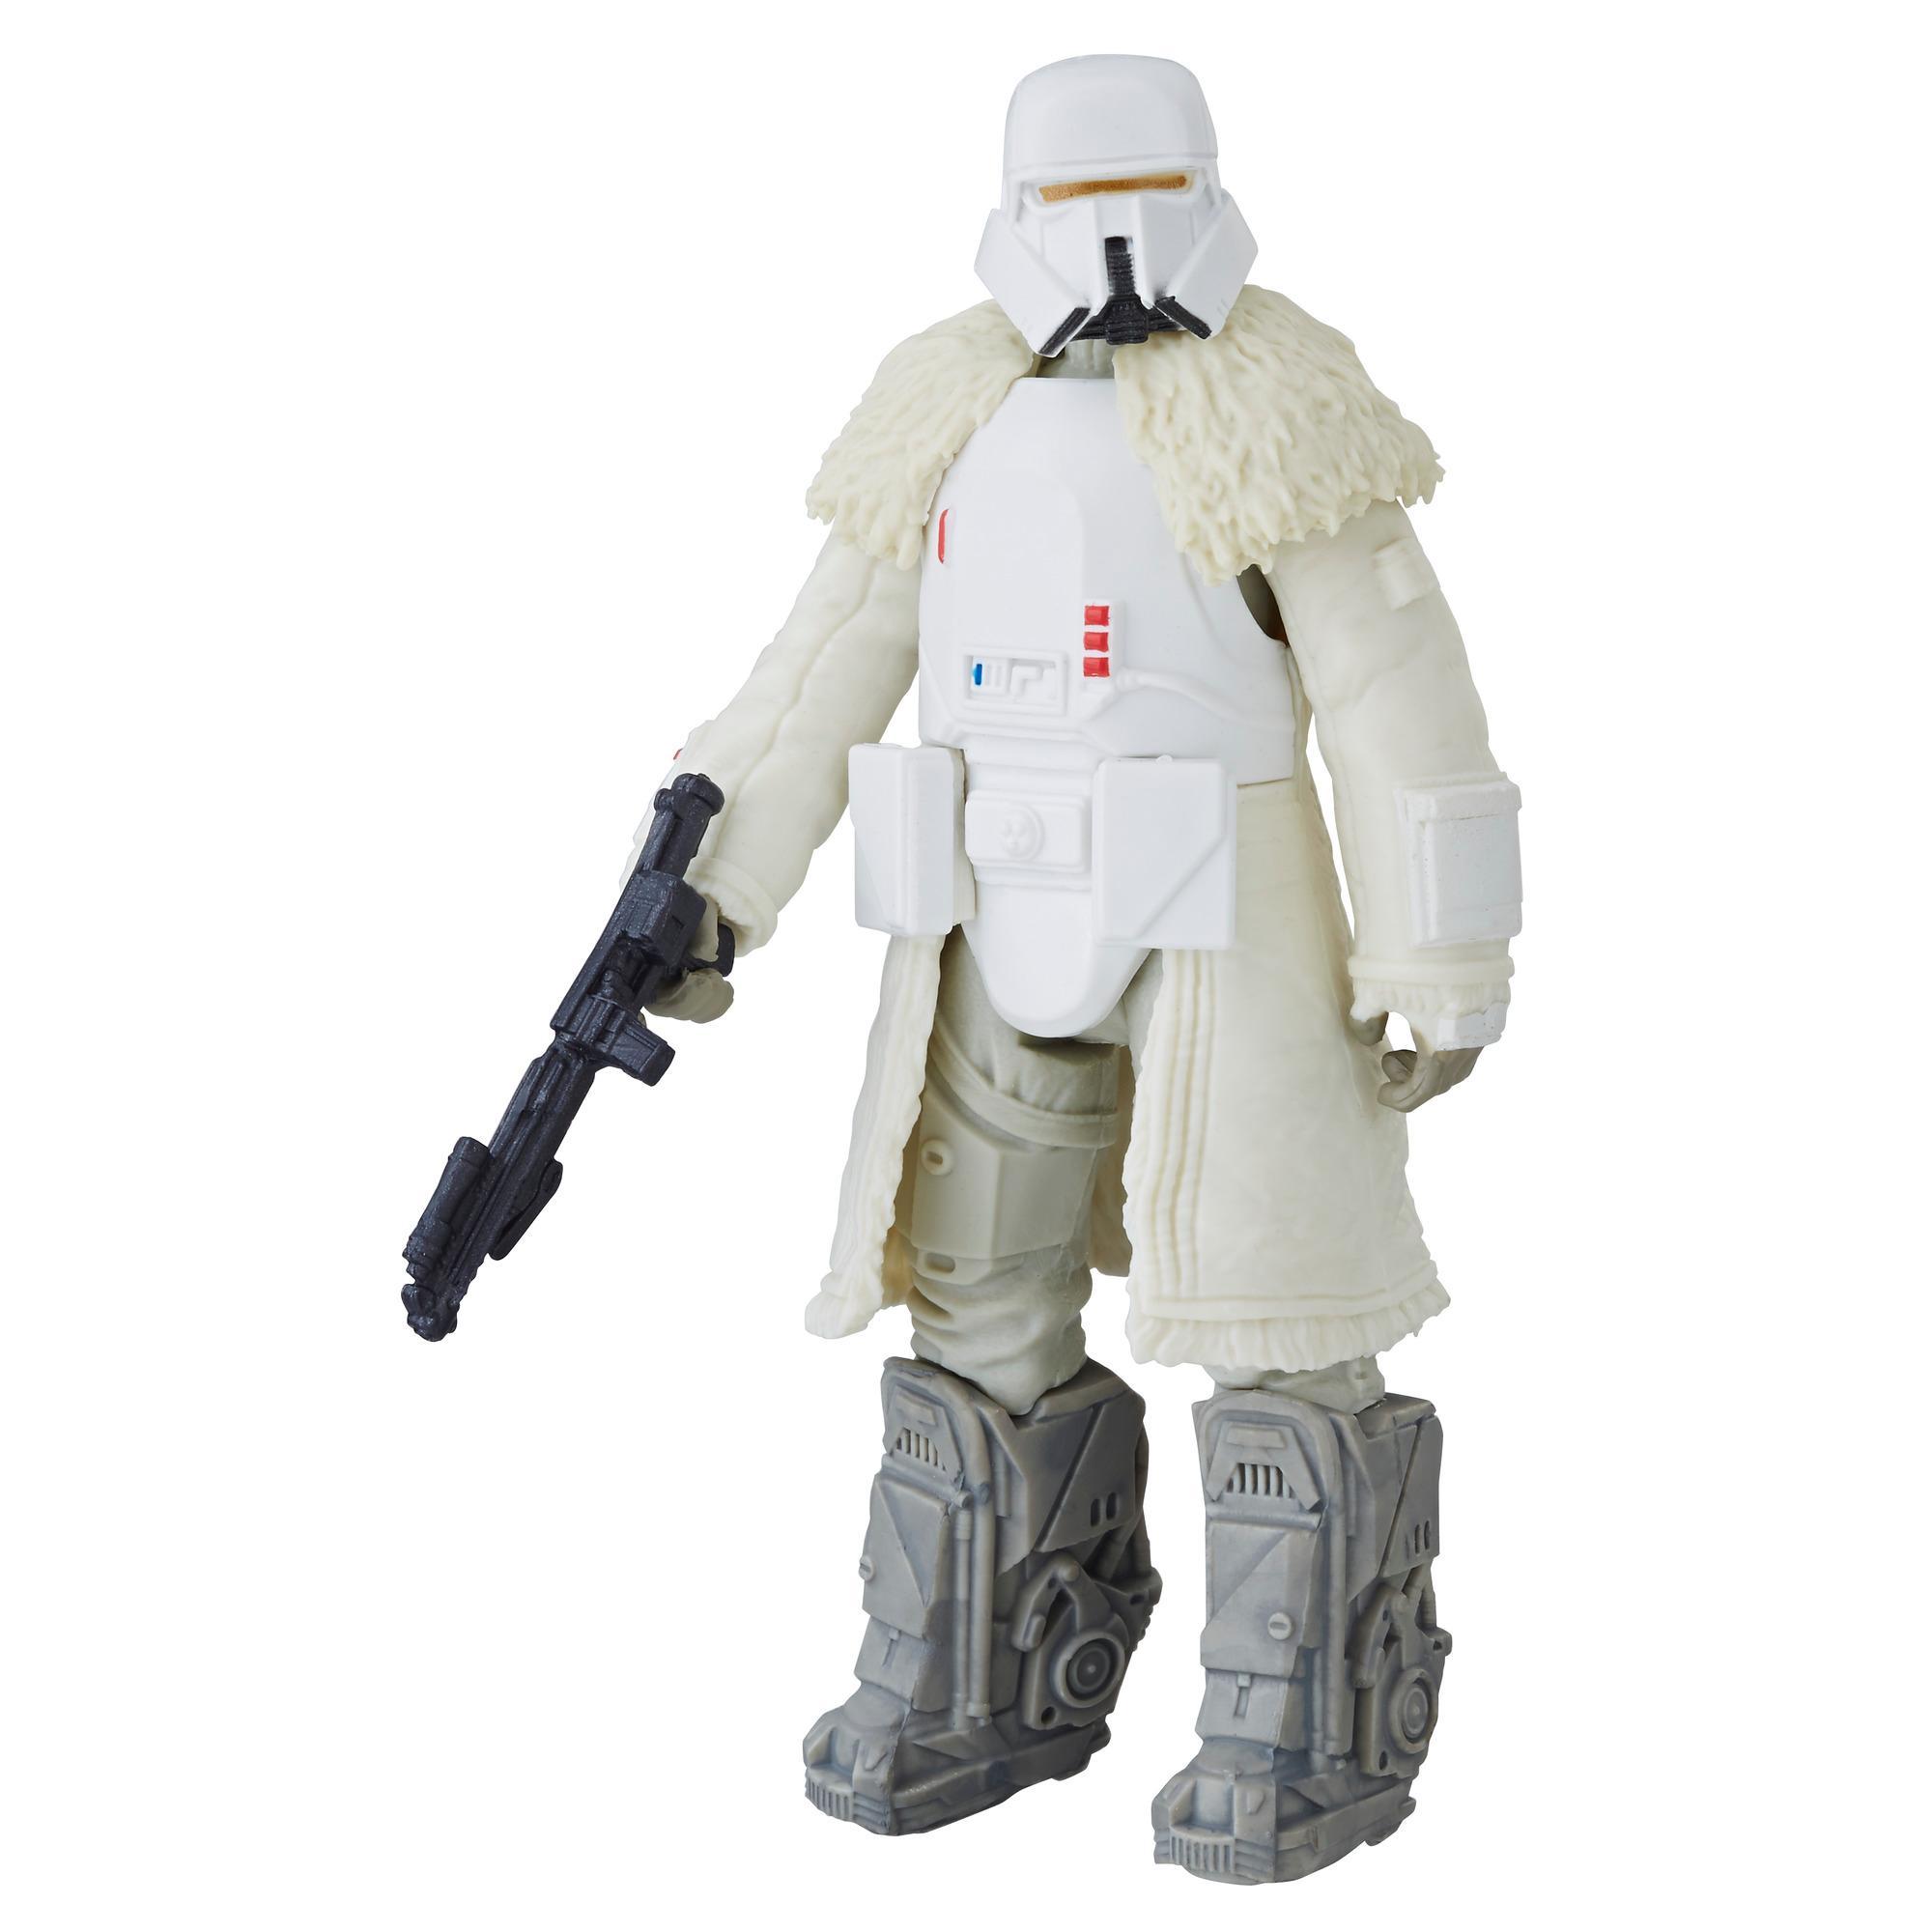 Star Wars Force Link 2.0 - Figurine Trooper frontalier